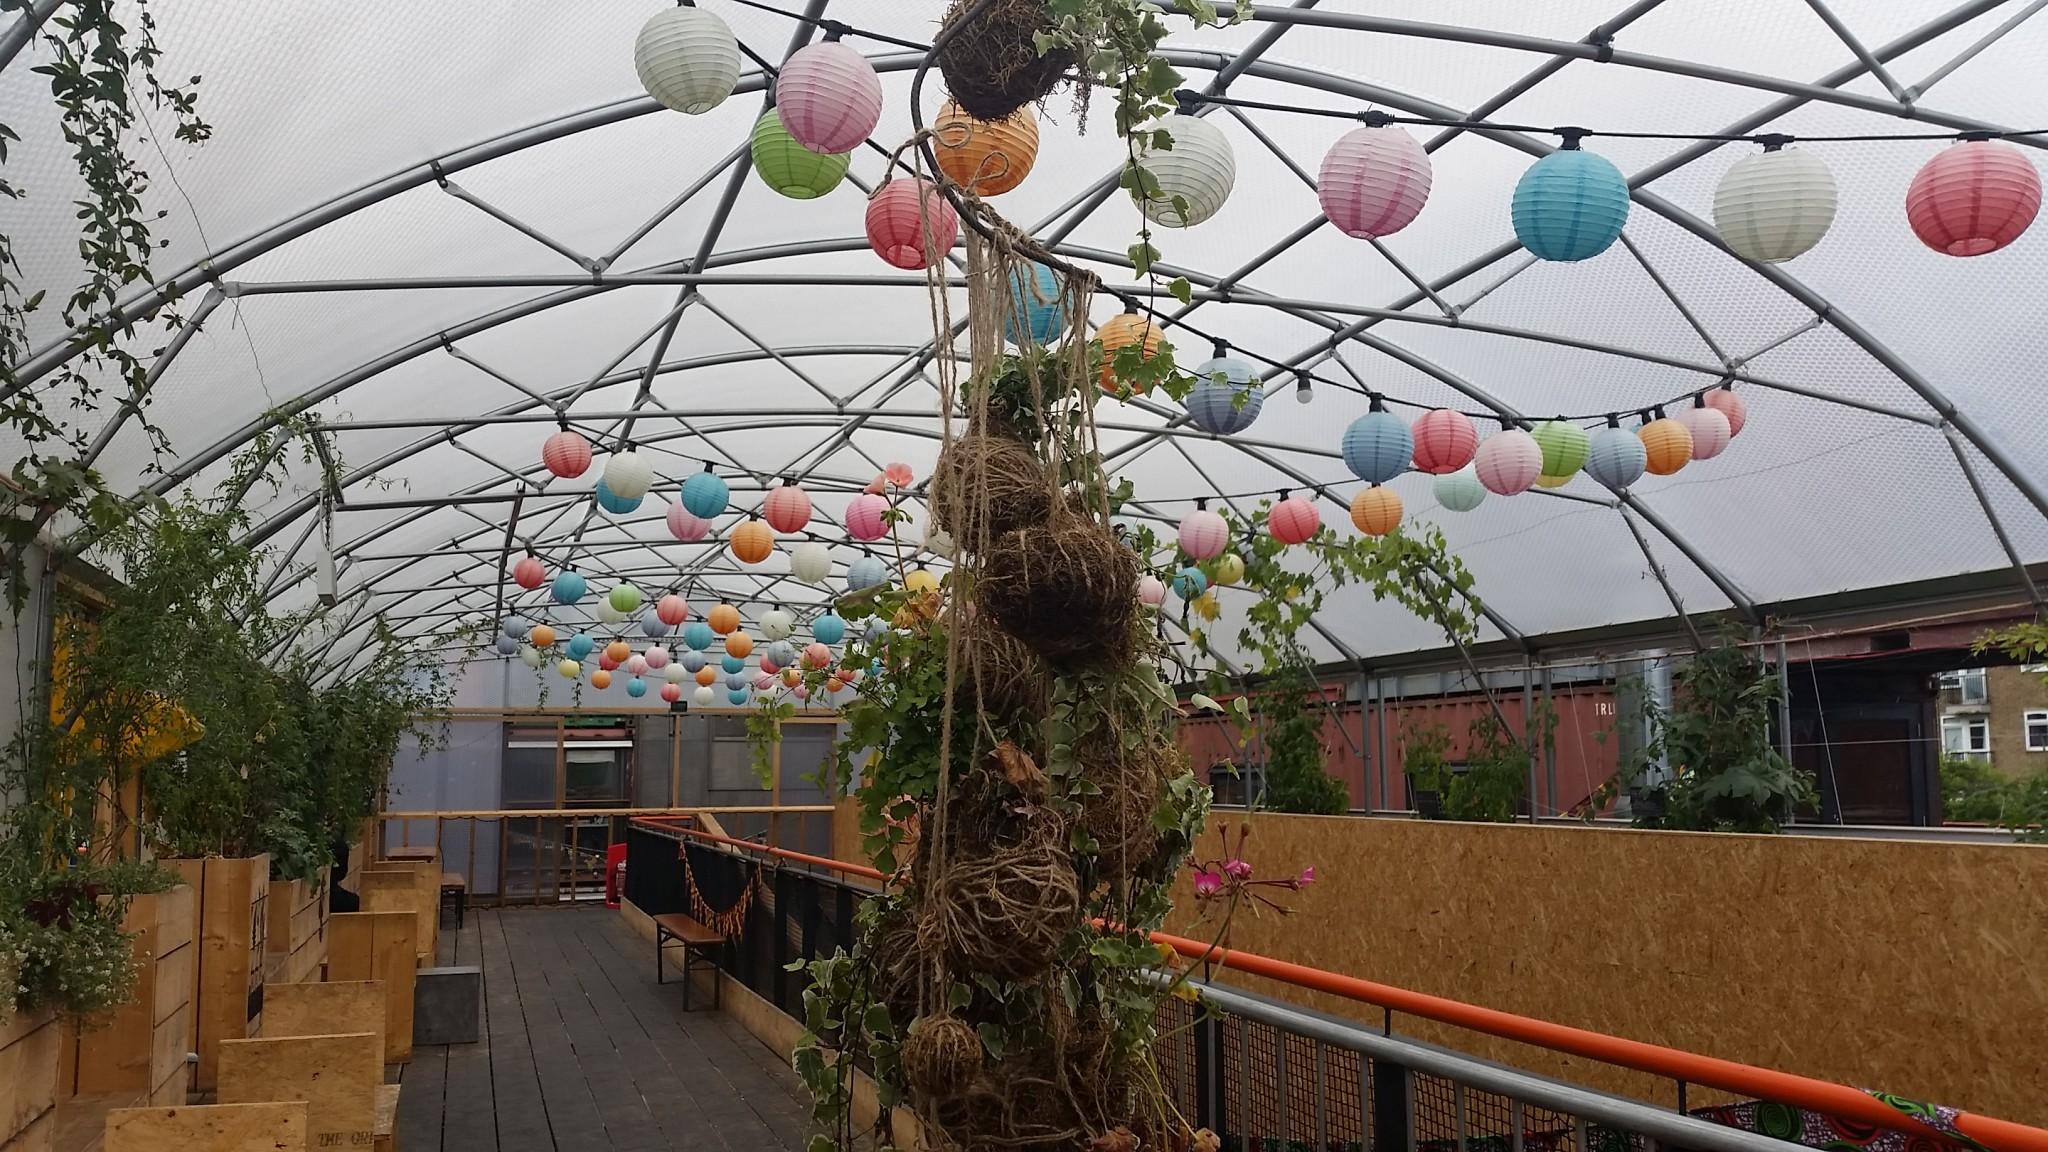 The greenhouse collective - Greenhouse Collective Inspiring Community Spaces At Pop Brixton